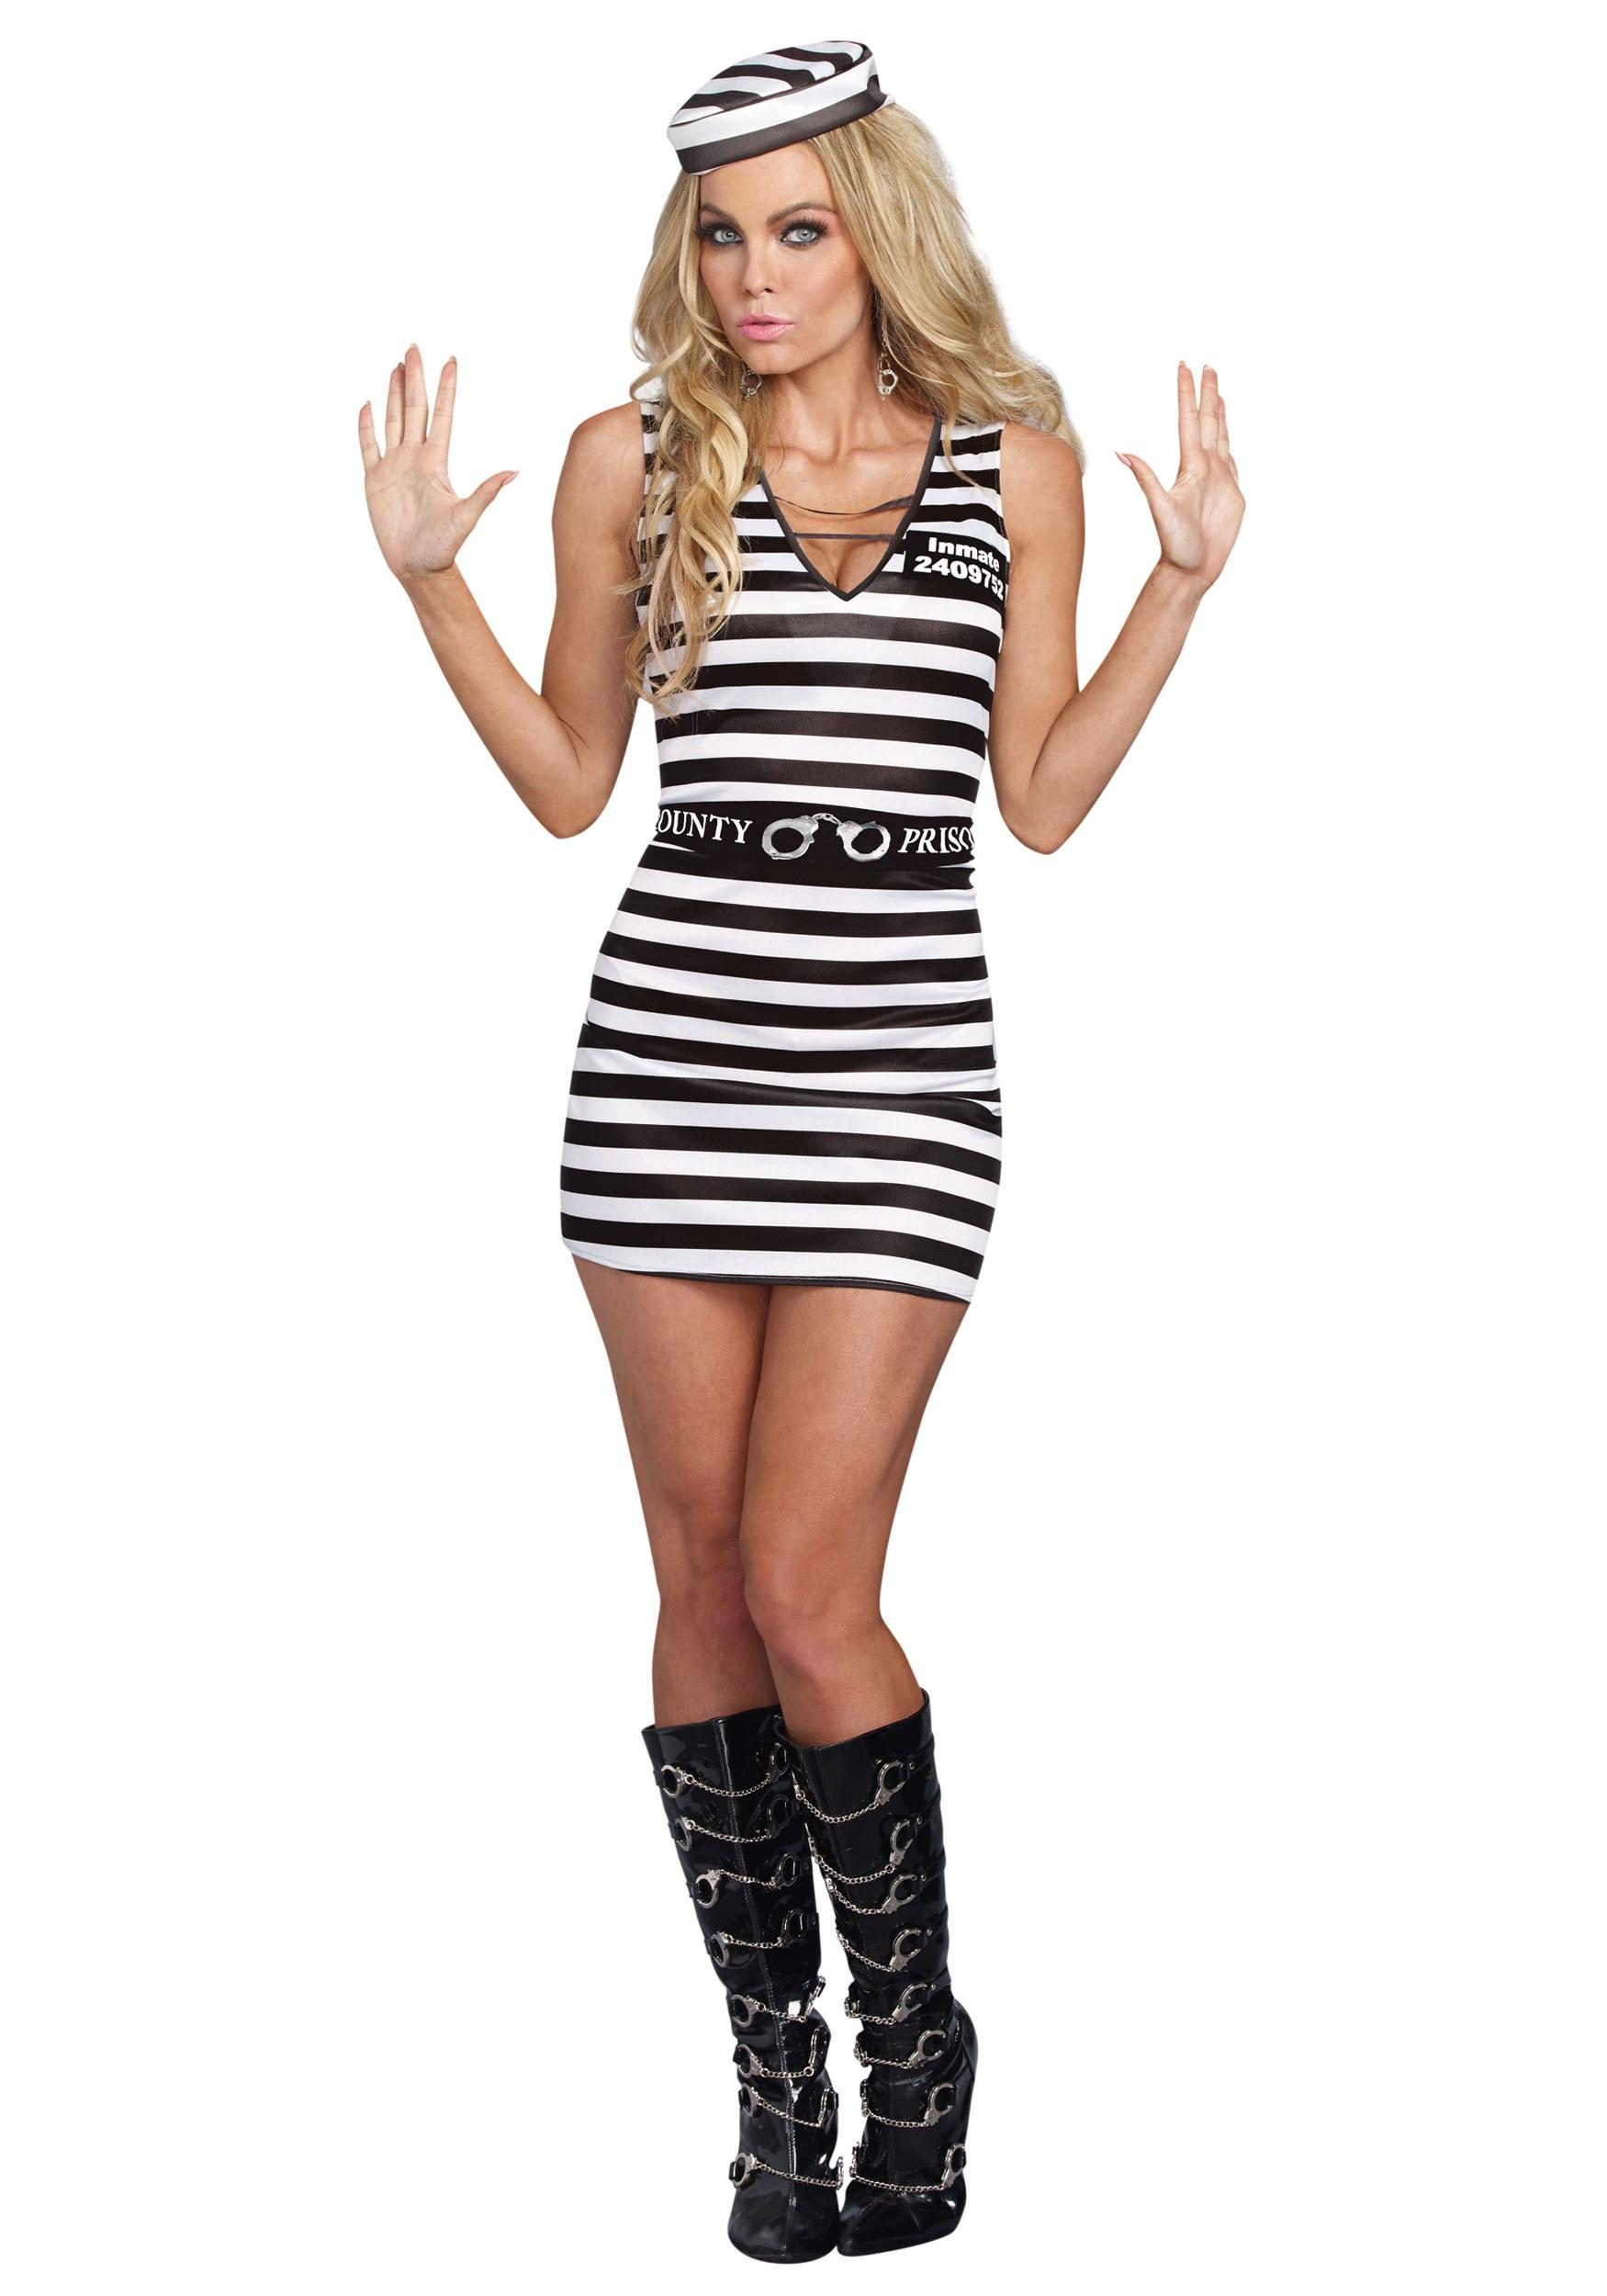 prisoner sexy costume